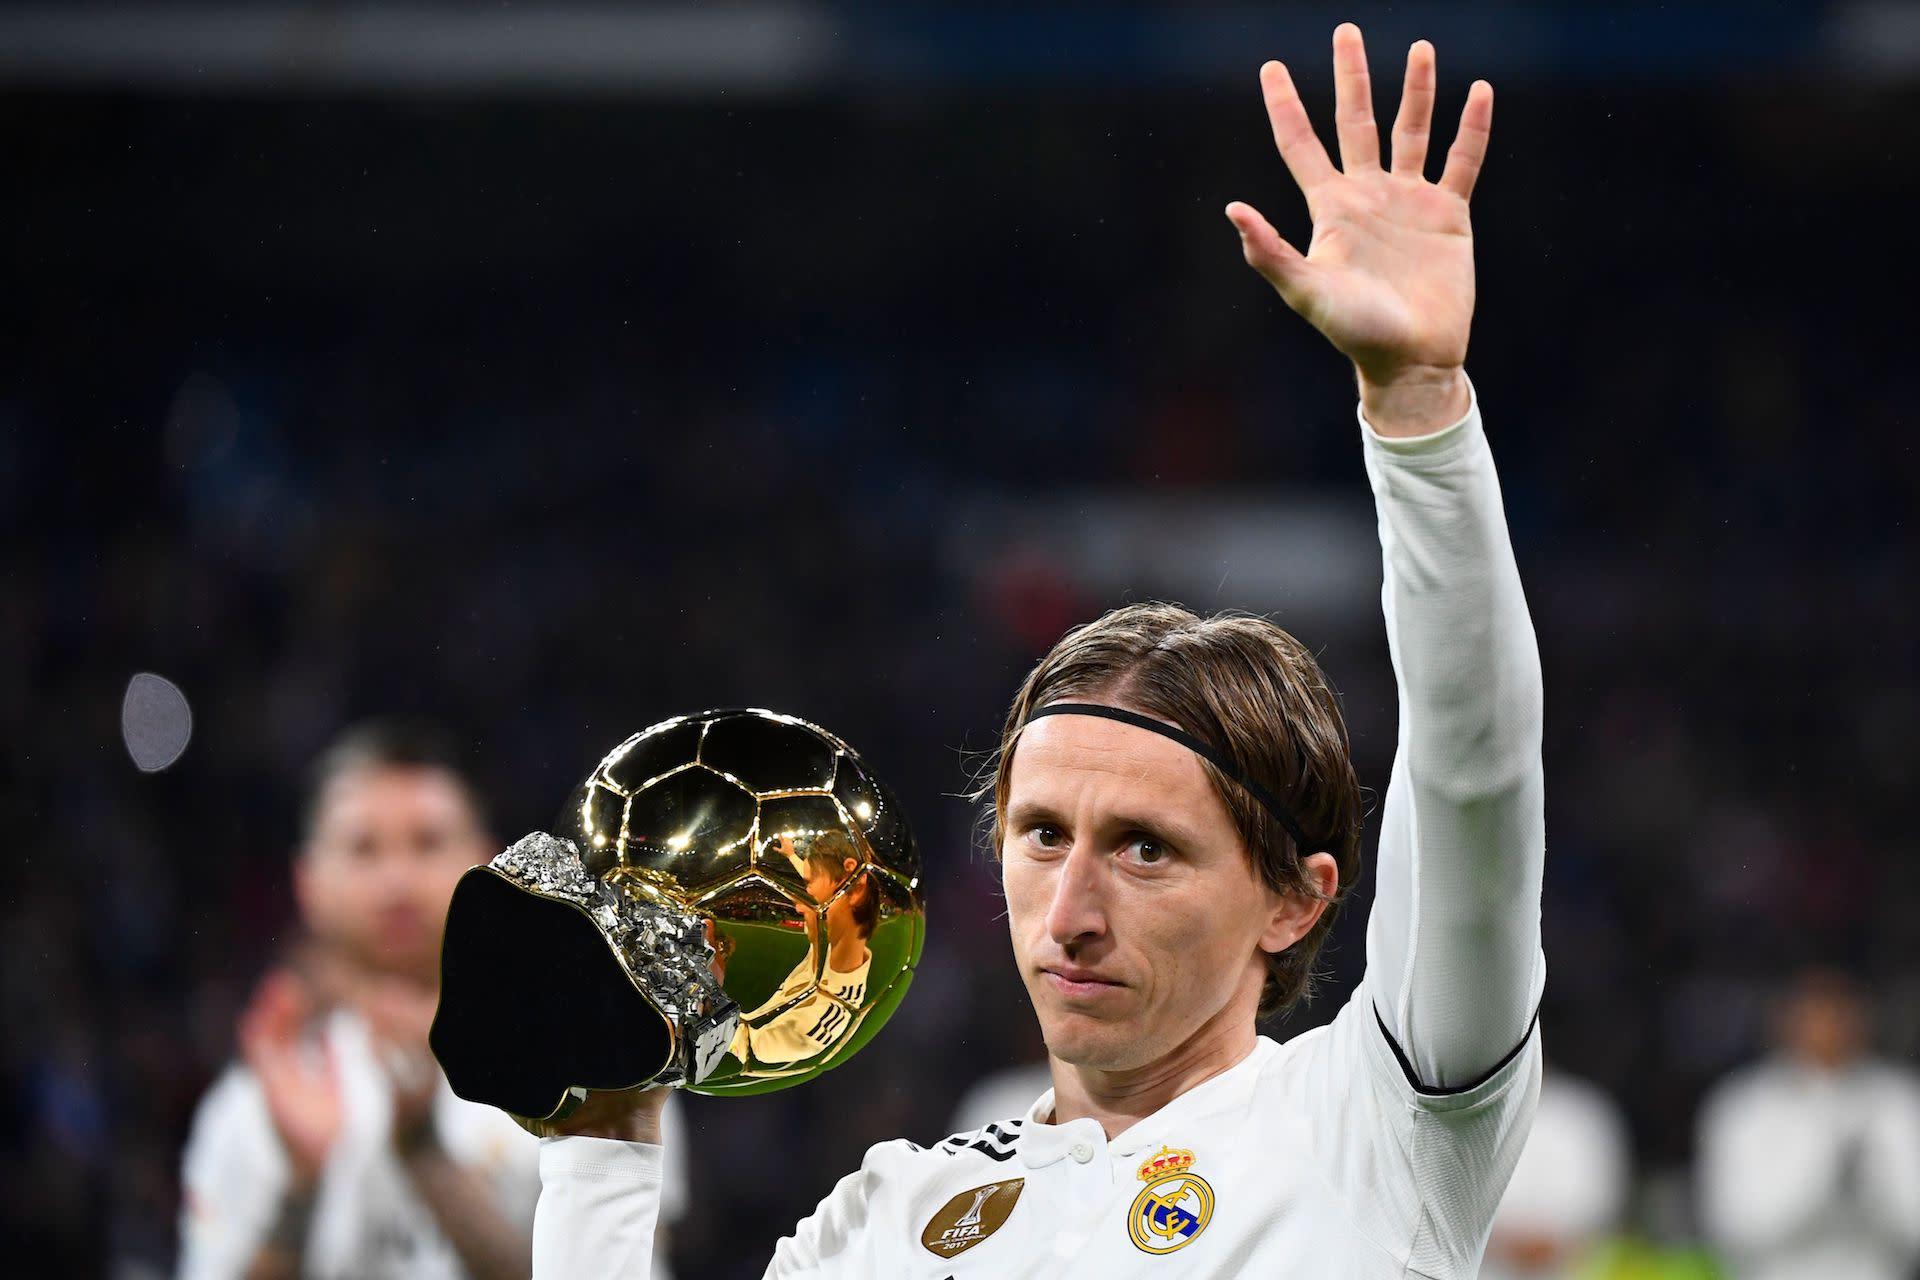 Luka Modric didn't seem happy that Cristiano Ronaldo and Lionel Messi decided to skip the Ballon d'Or ceremony. (Goal.com)